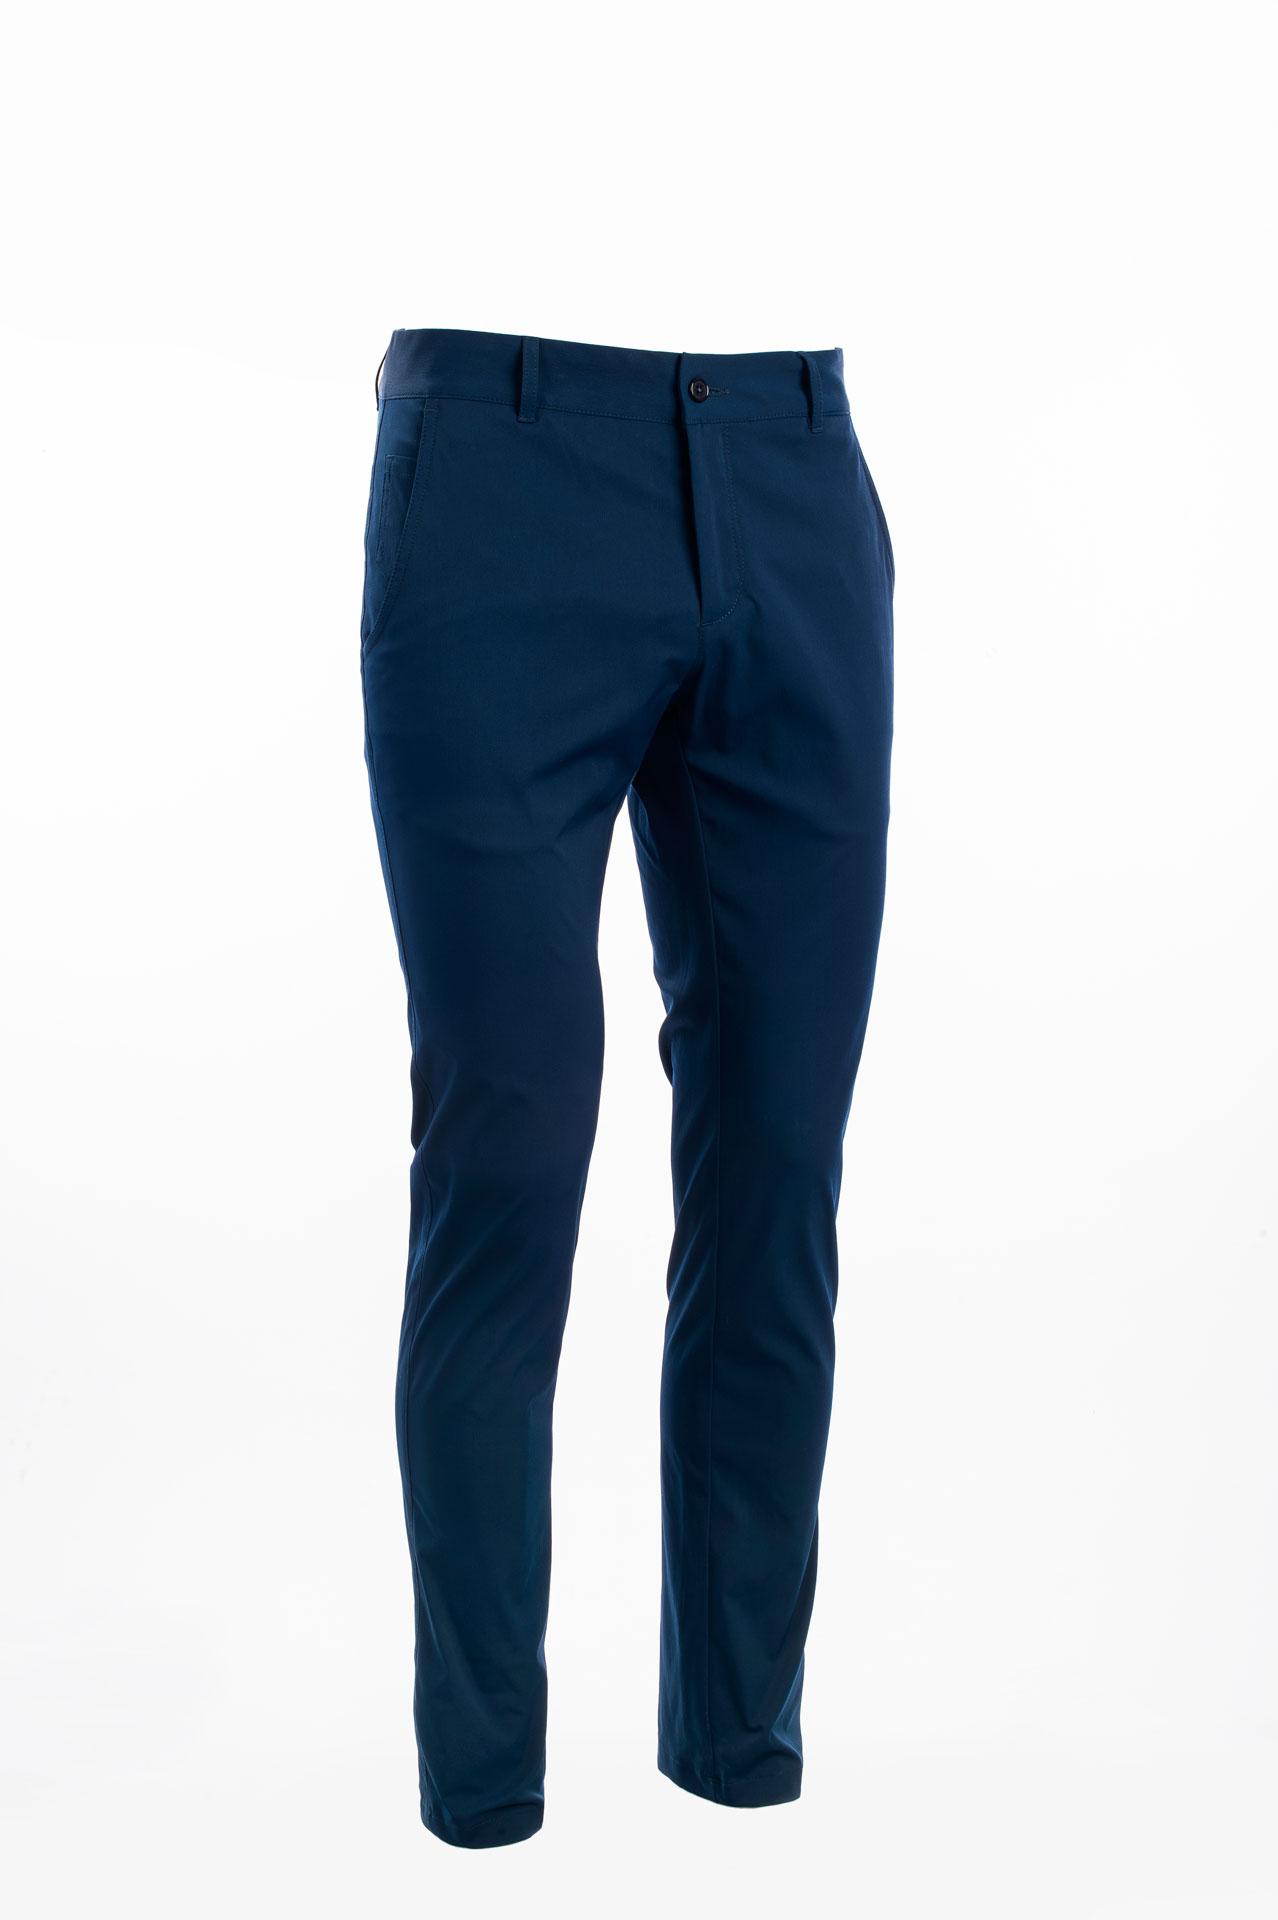 Pantalone lungo Art. 1000 colore 5868 navy